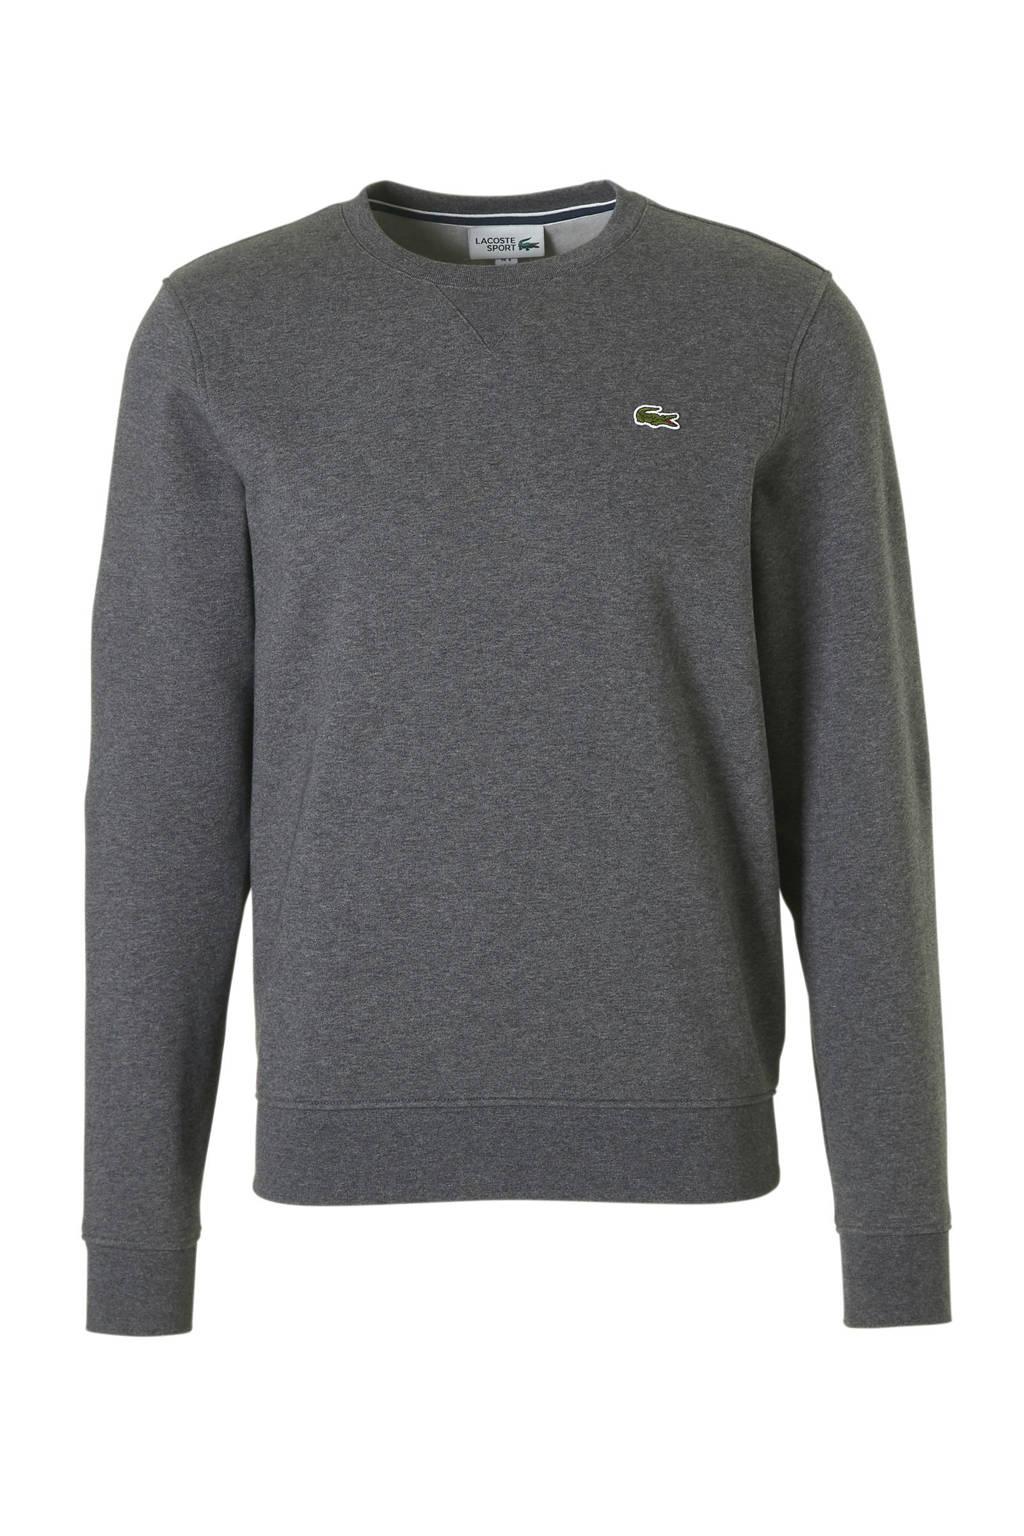 Lacoste   sweater, Grijs